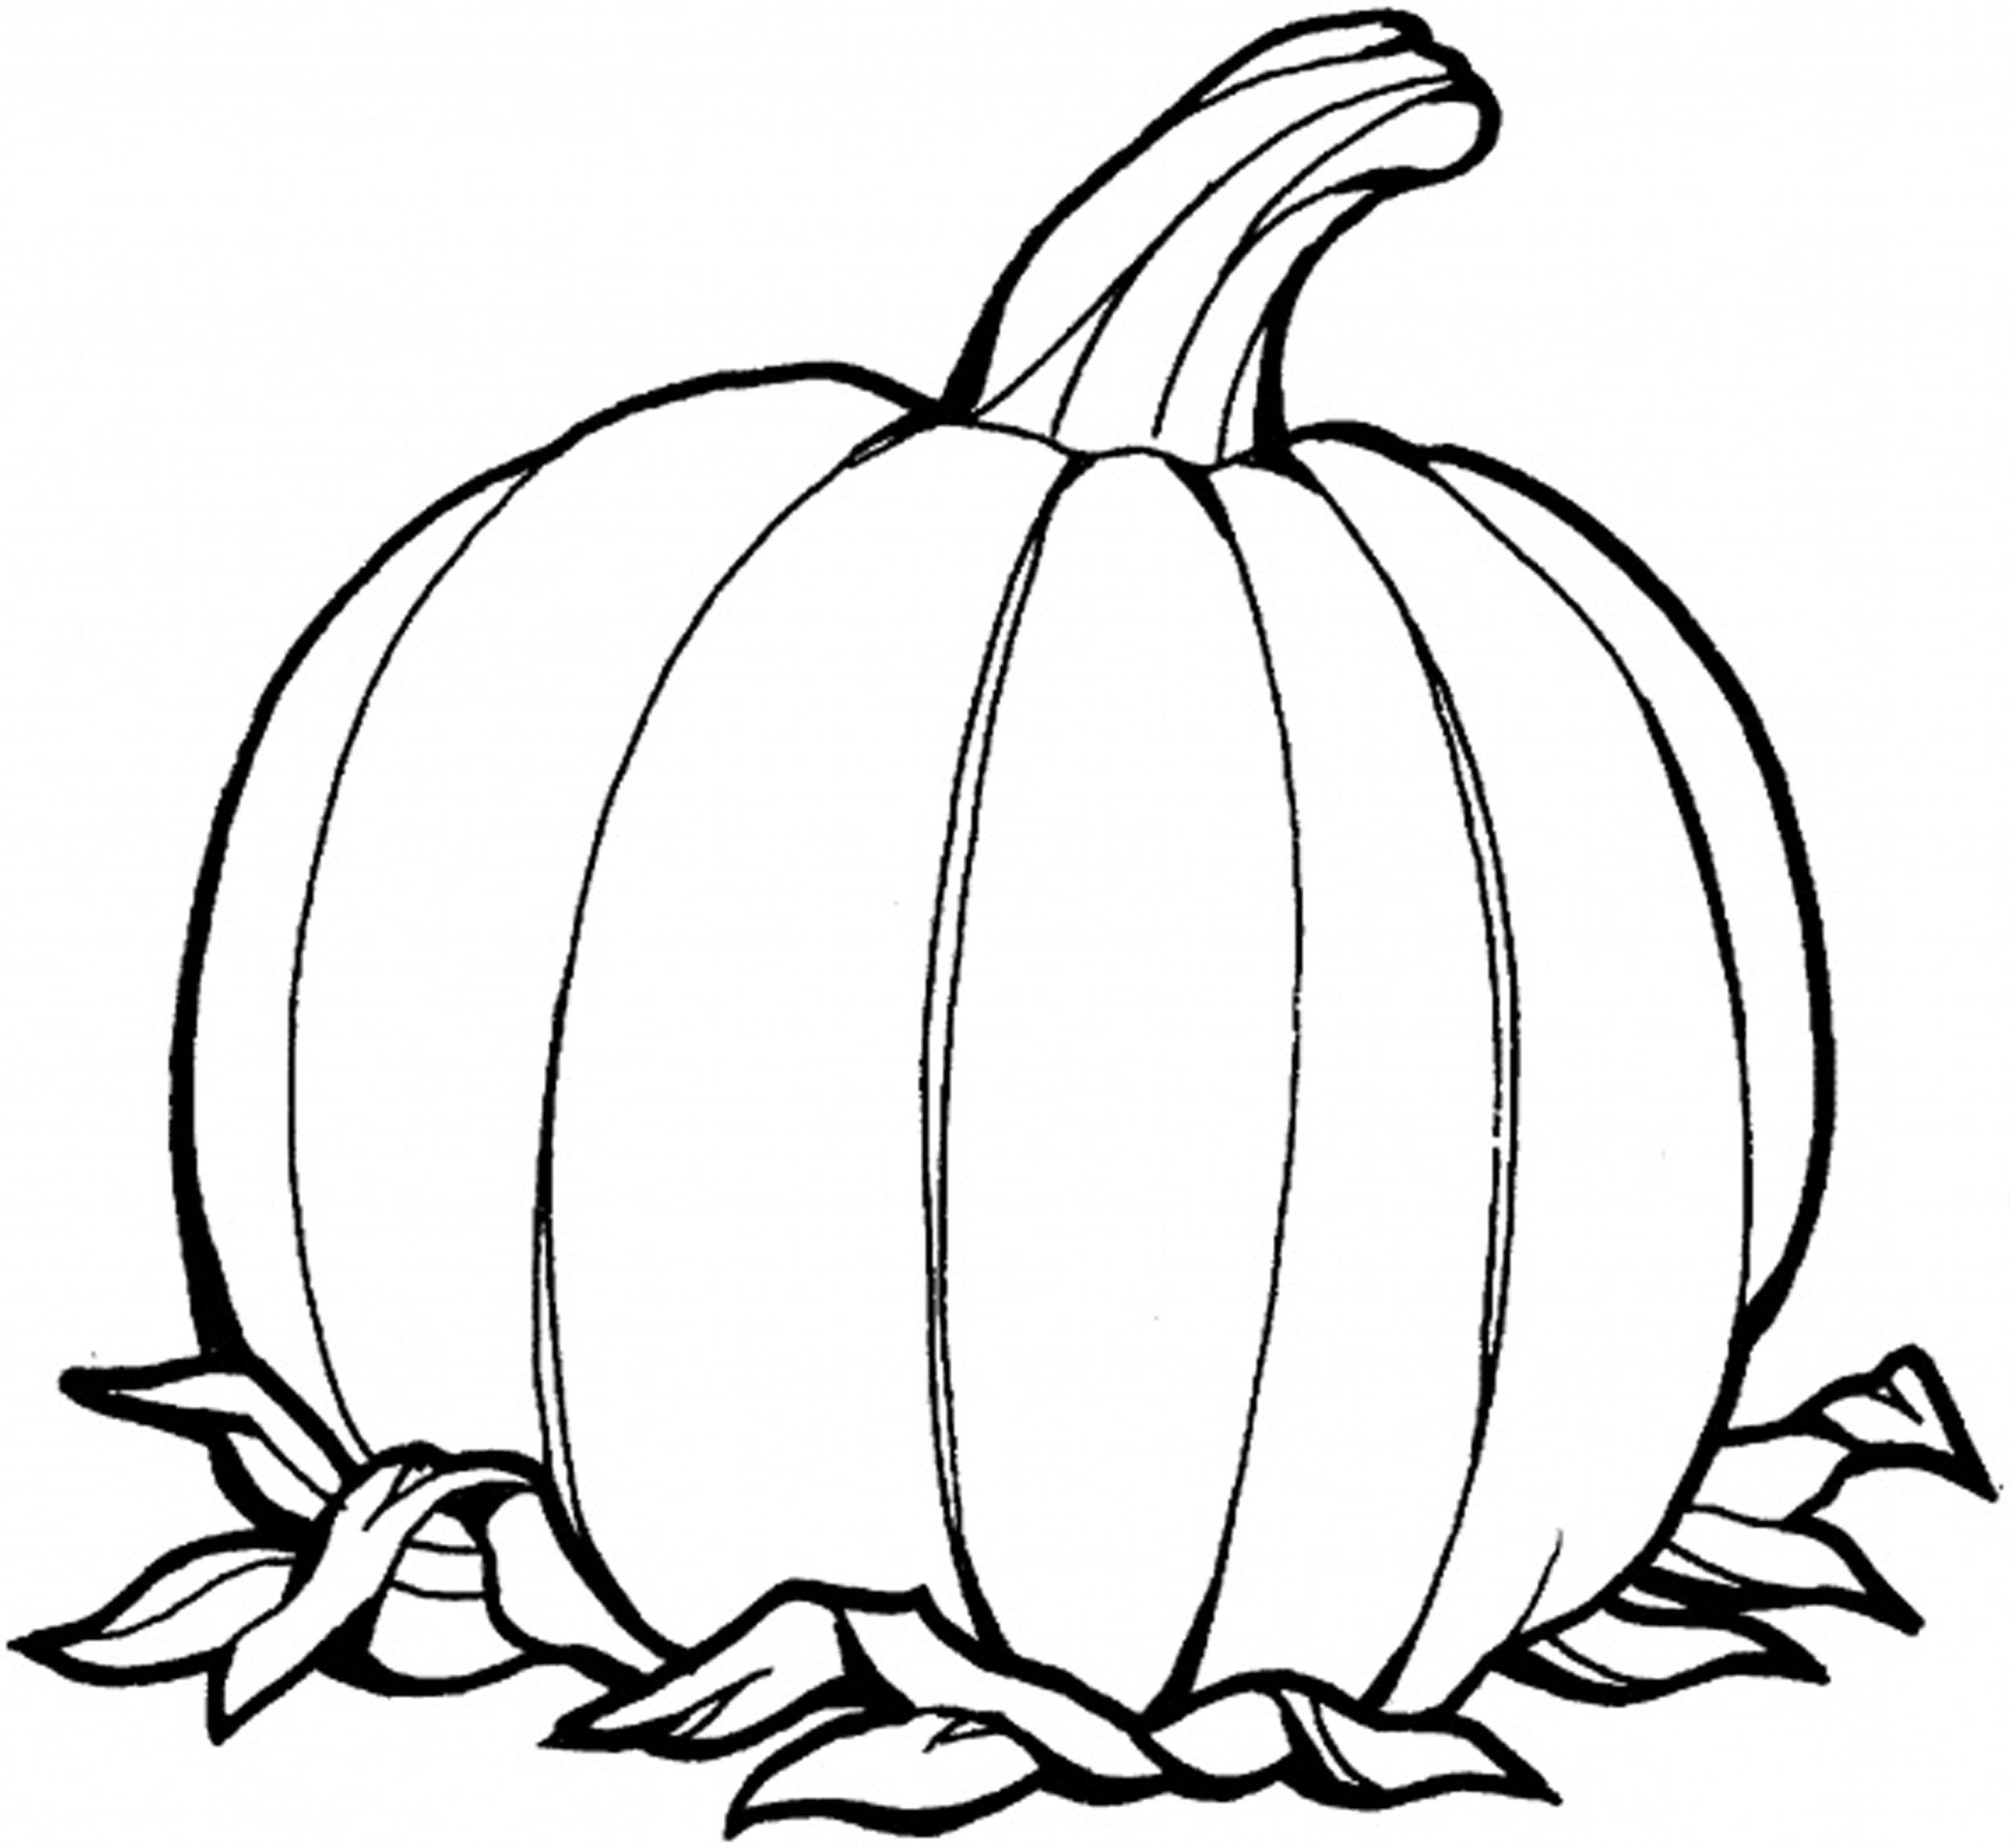 2550x2345 Coloring Pages Pumpkin For Kids Excellent Best Of Pumpkins